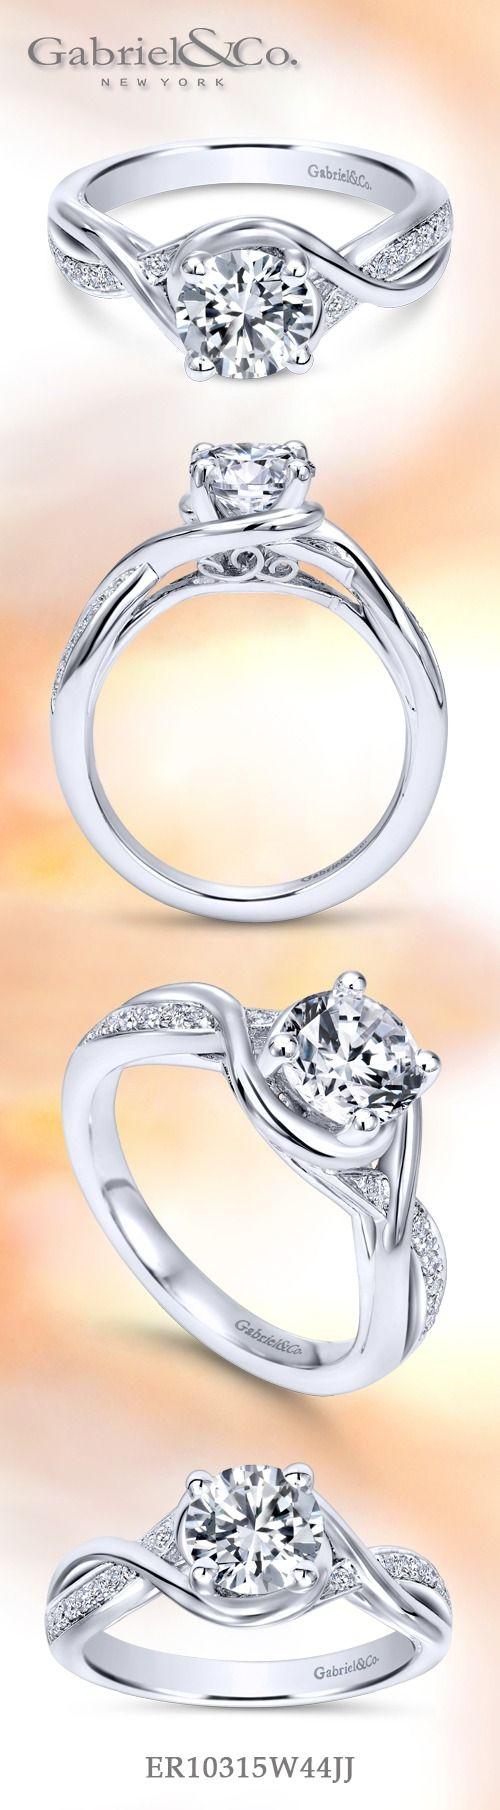 14k White Gold Diamond Criss Cross Round Engagement Ring